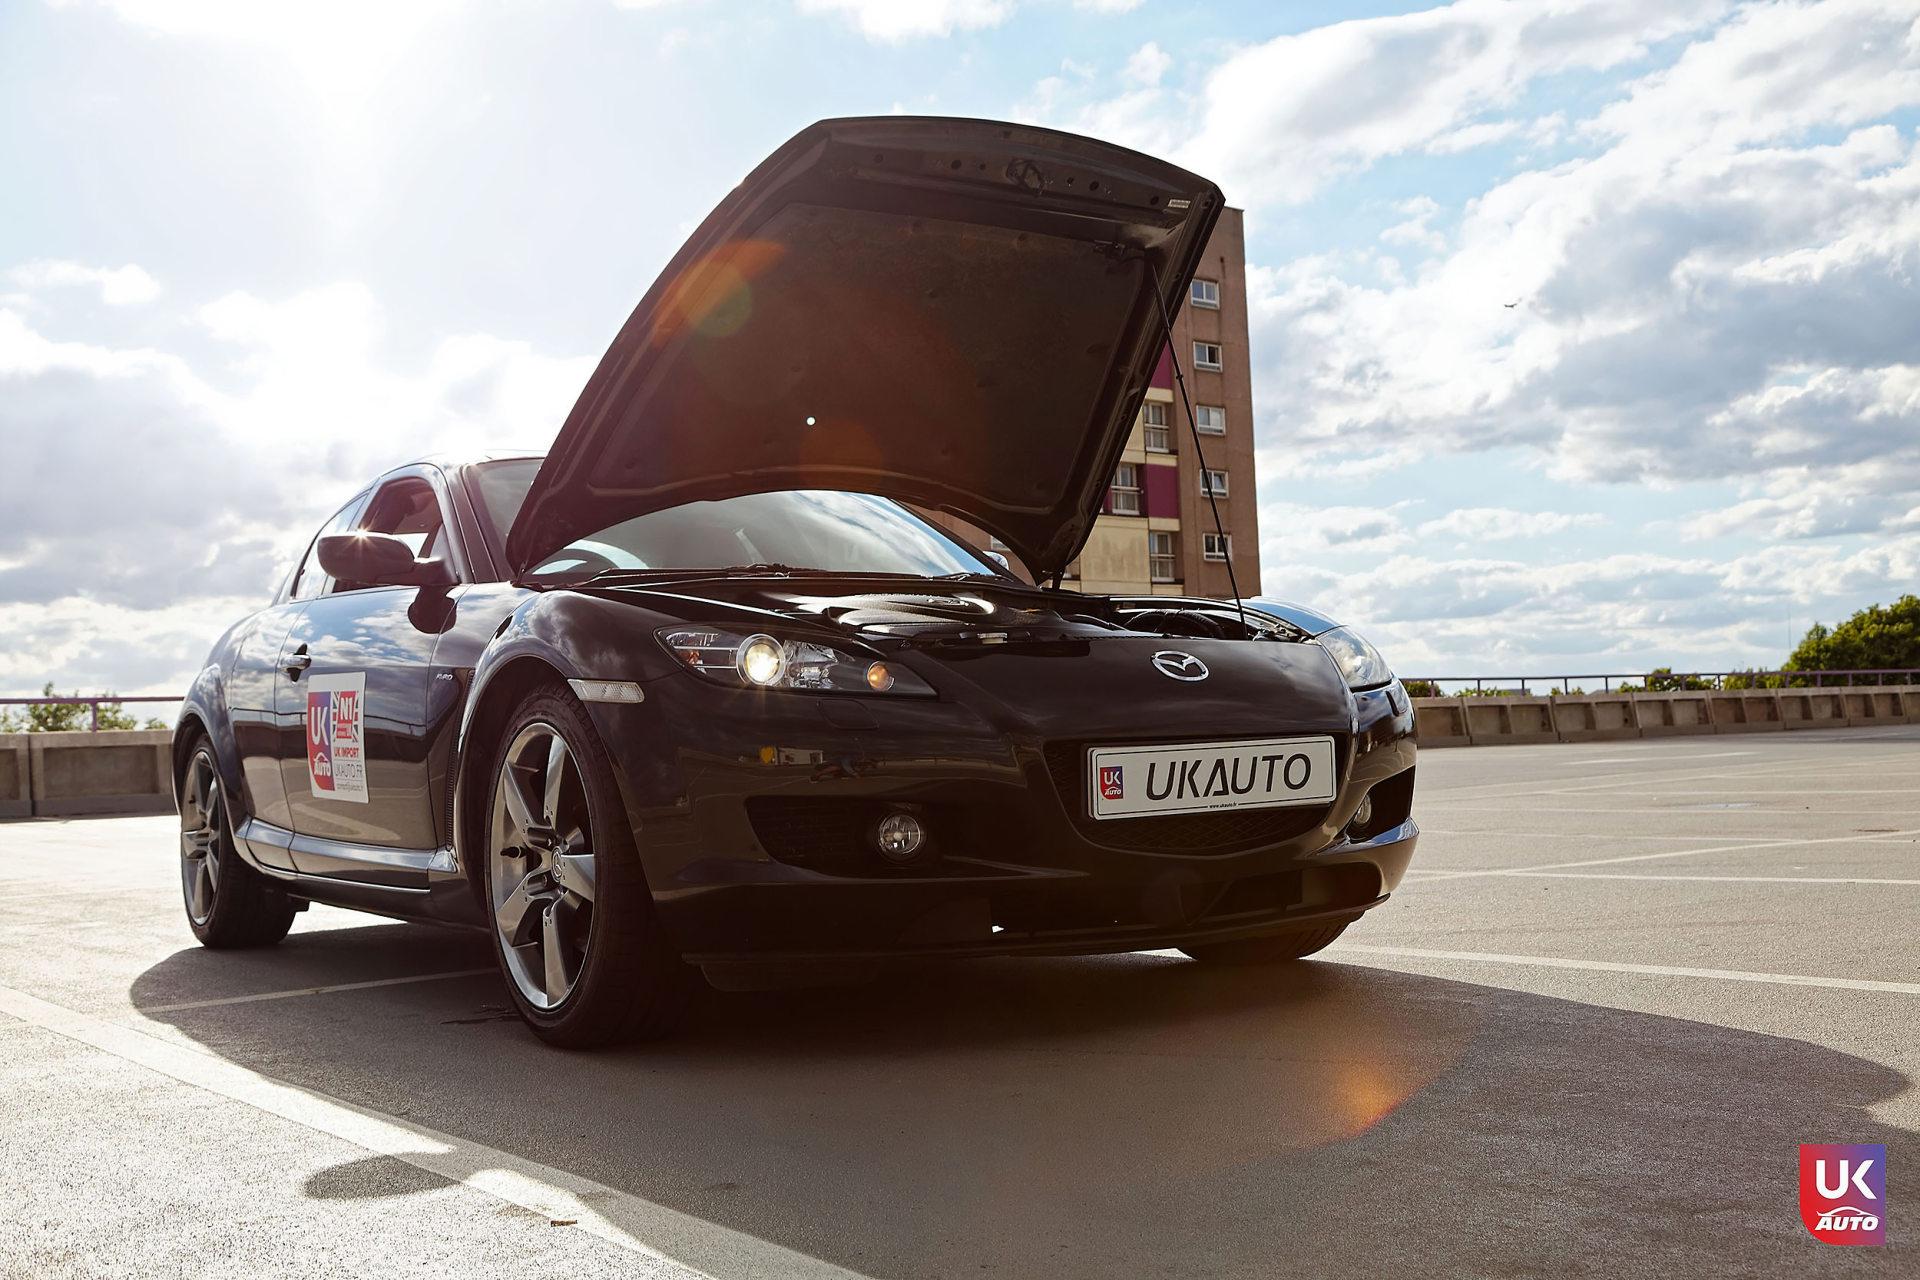 Mazda RX8 Rotary mazda angleterre mazda uk RX8 KURO import uk rhd12 DxO - Import Mazda RX8 KURO ROTARY depuis Autotrader par UKAUTO site annonces UK rhd Felicitation a Dimitri